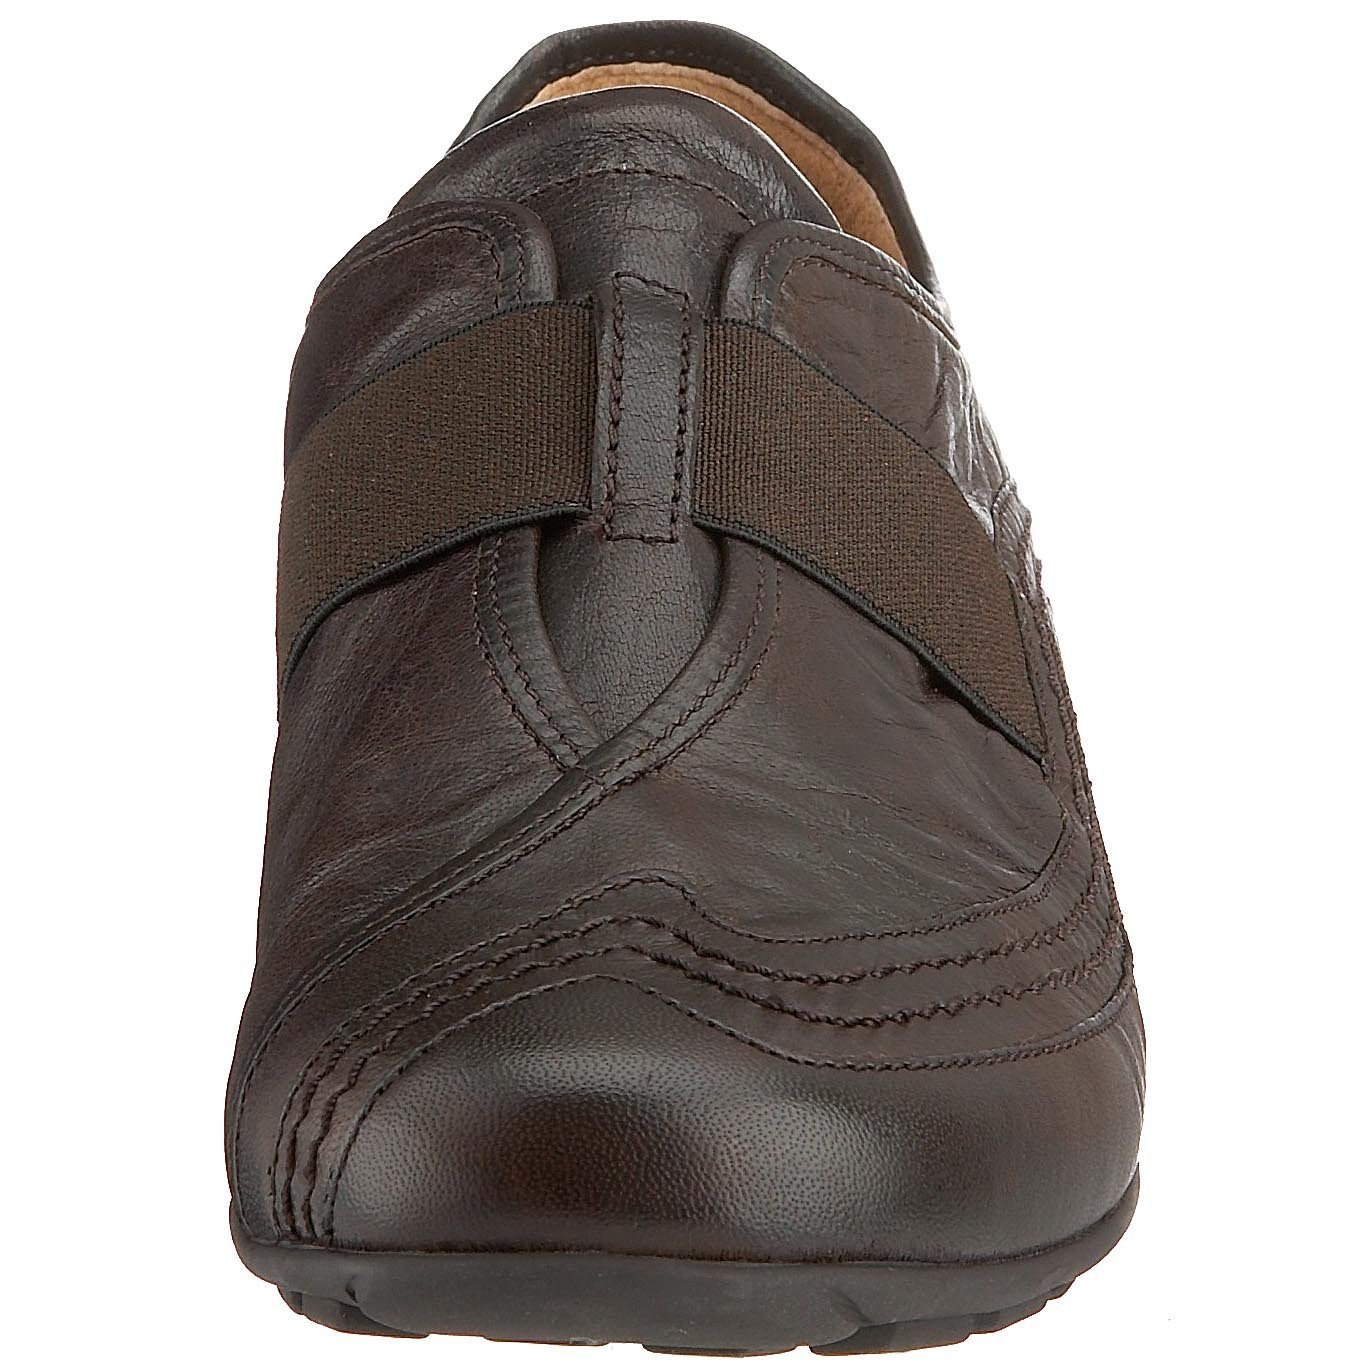 Gabor Damen Schuhe Women Shoes 94.128.58 Sneaker Slipper